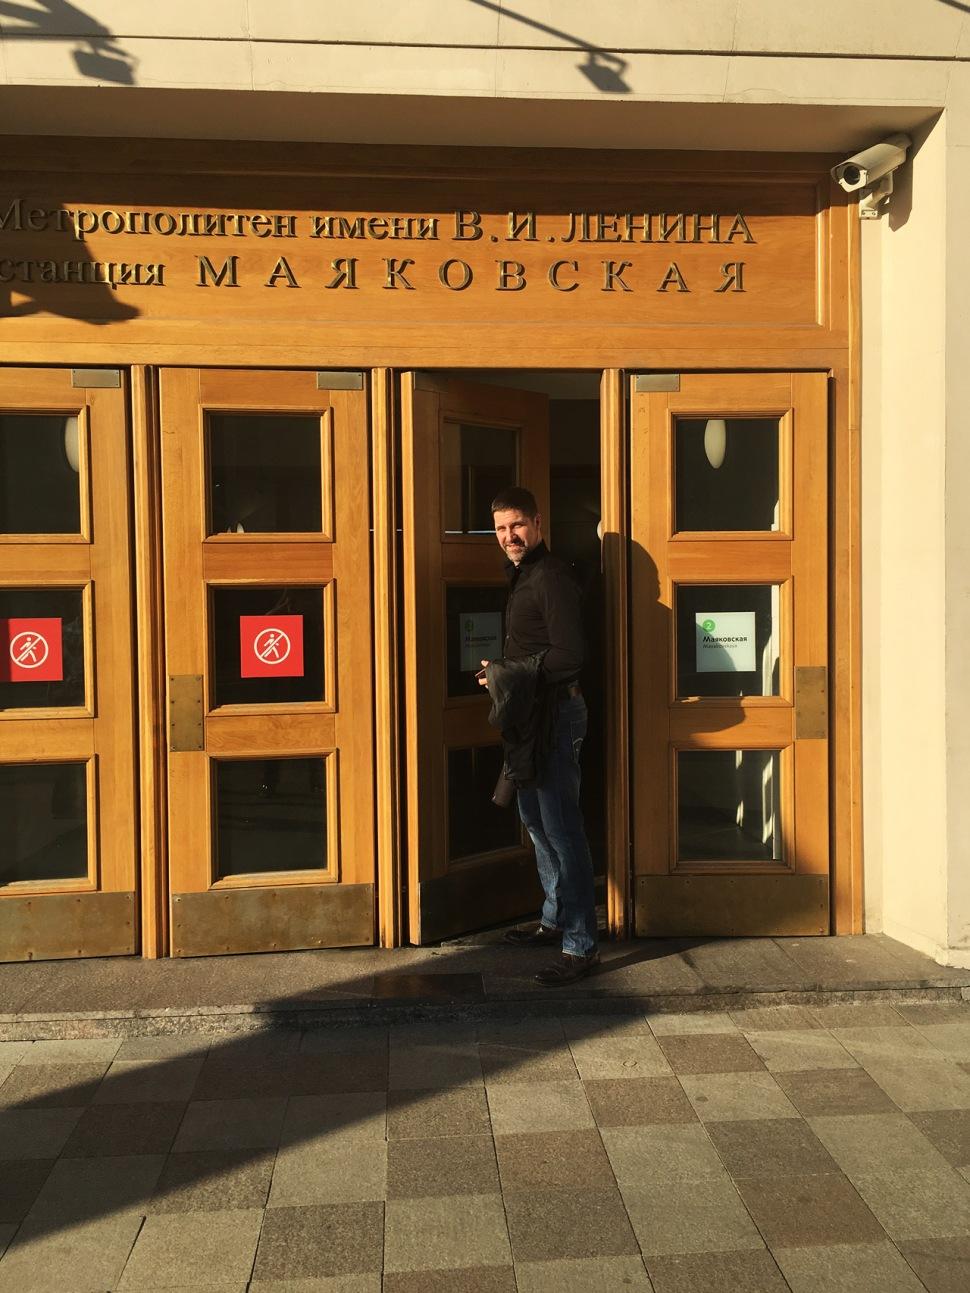 180626-panerai-gtg-moscow-mayakovskaya-metro-station-entrance